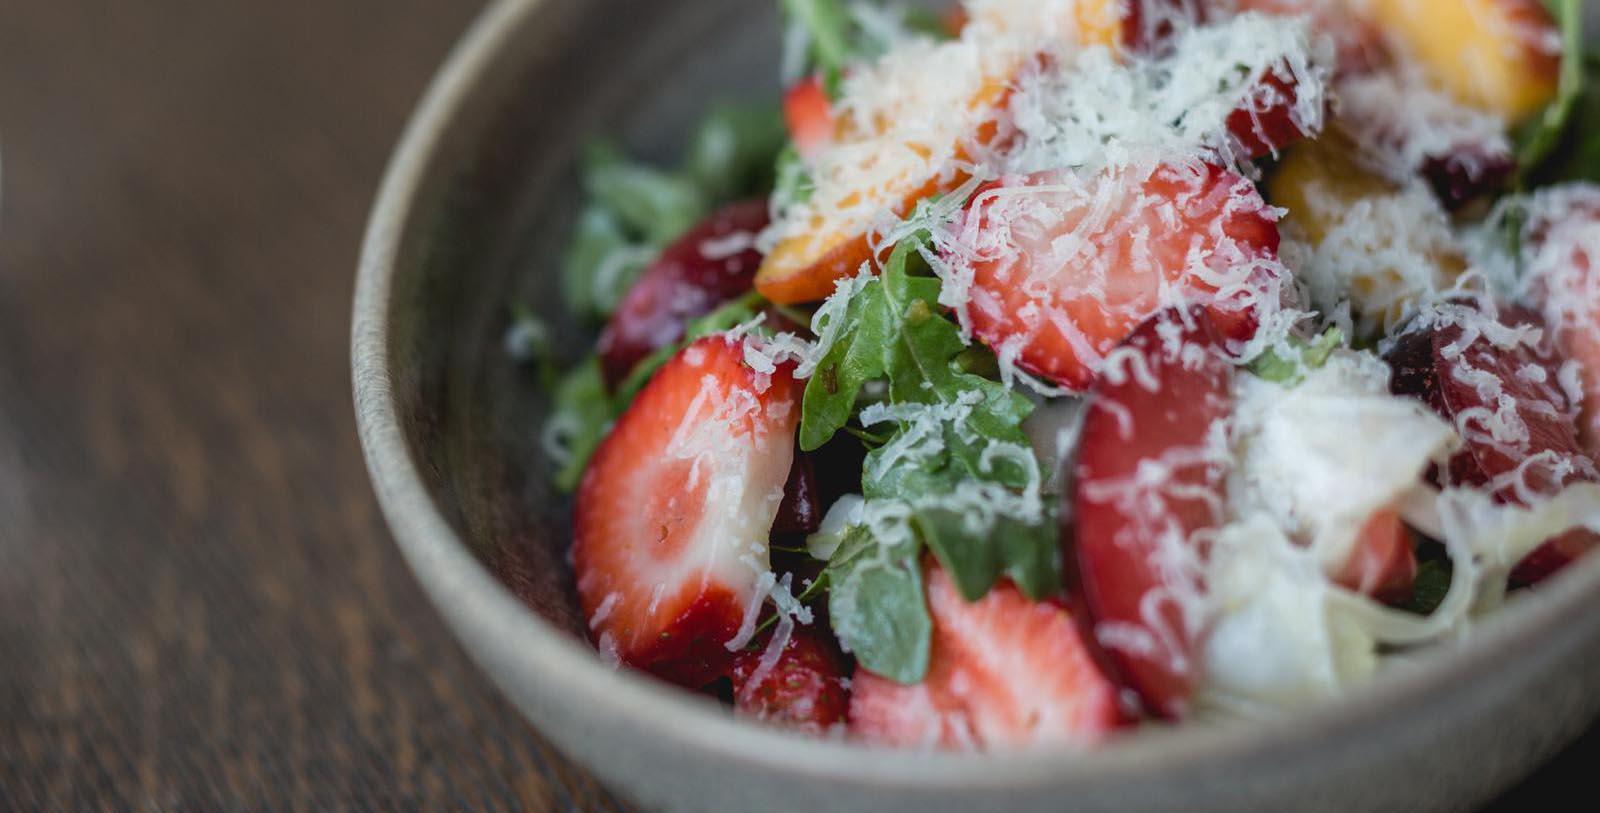 Image of Strawberrry Salad, Ojai Valley Inn, Ojai, California, 1923, Member of Historic Hotels of America, Taste